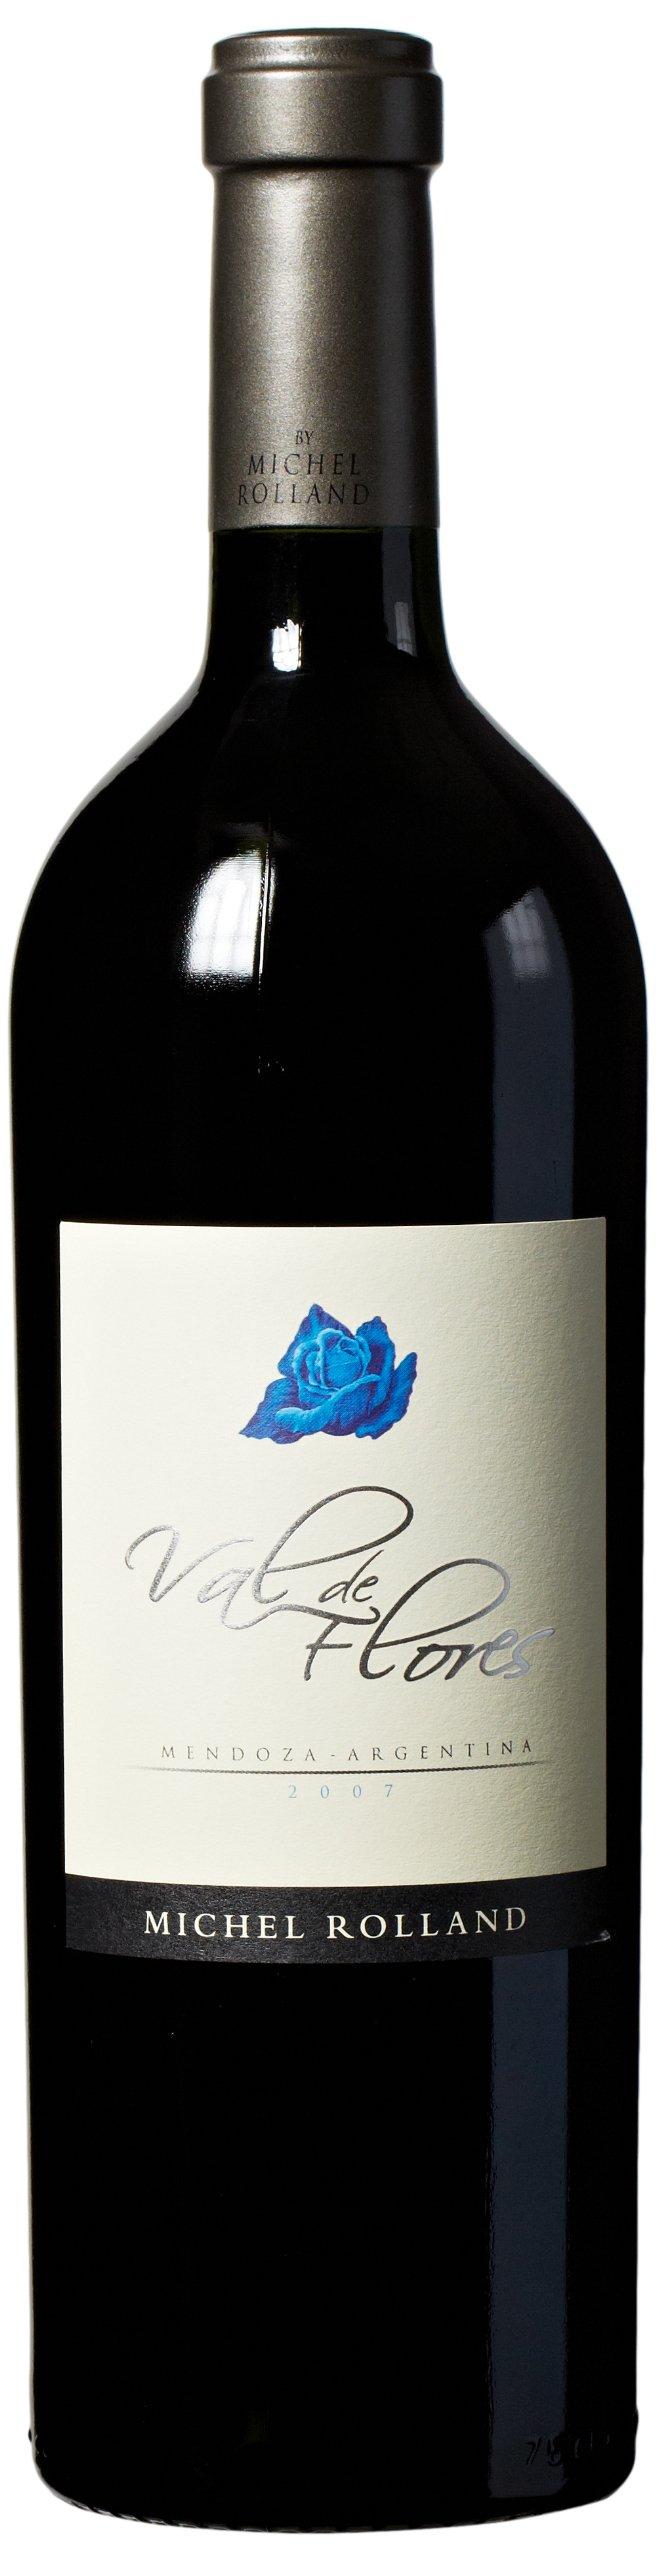 Michel Rolland Val De Flores Malbec Vista Flores Argentina Malbec Vinos Vinos Argentinos